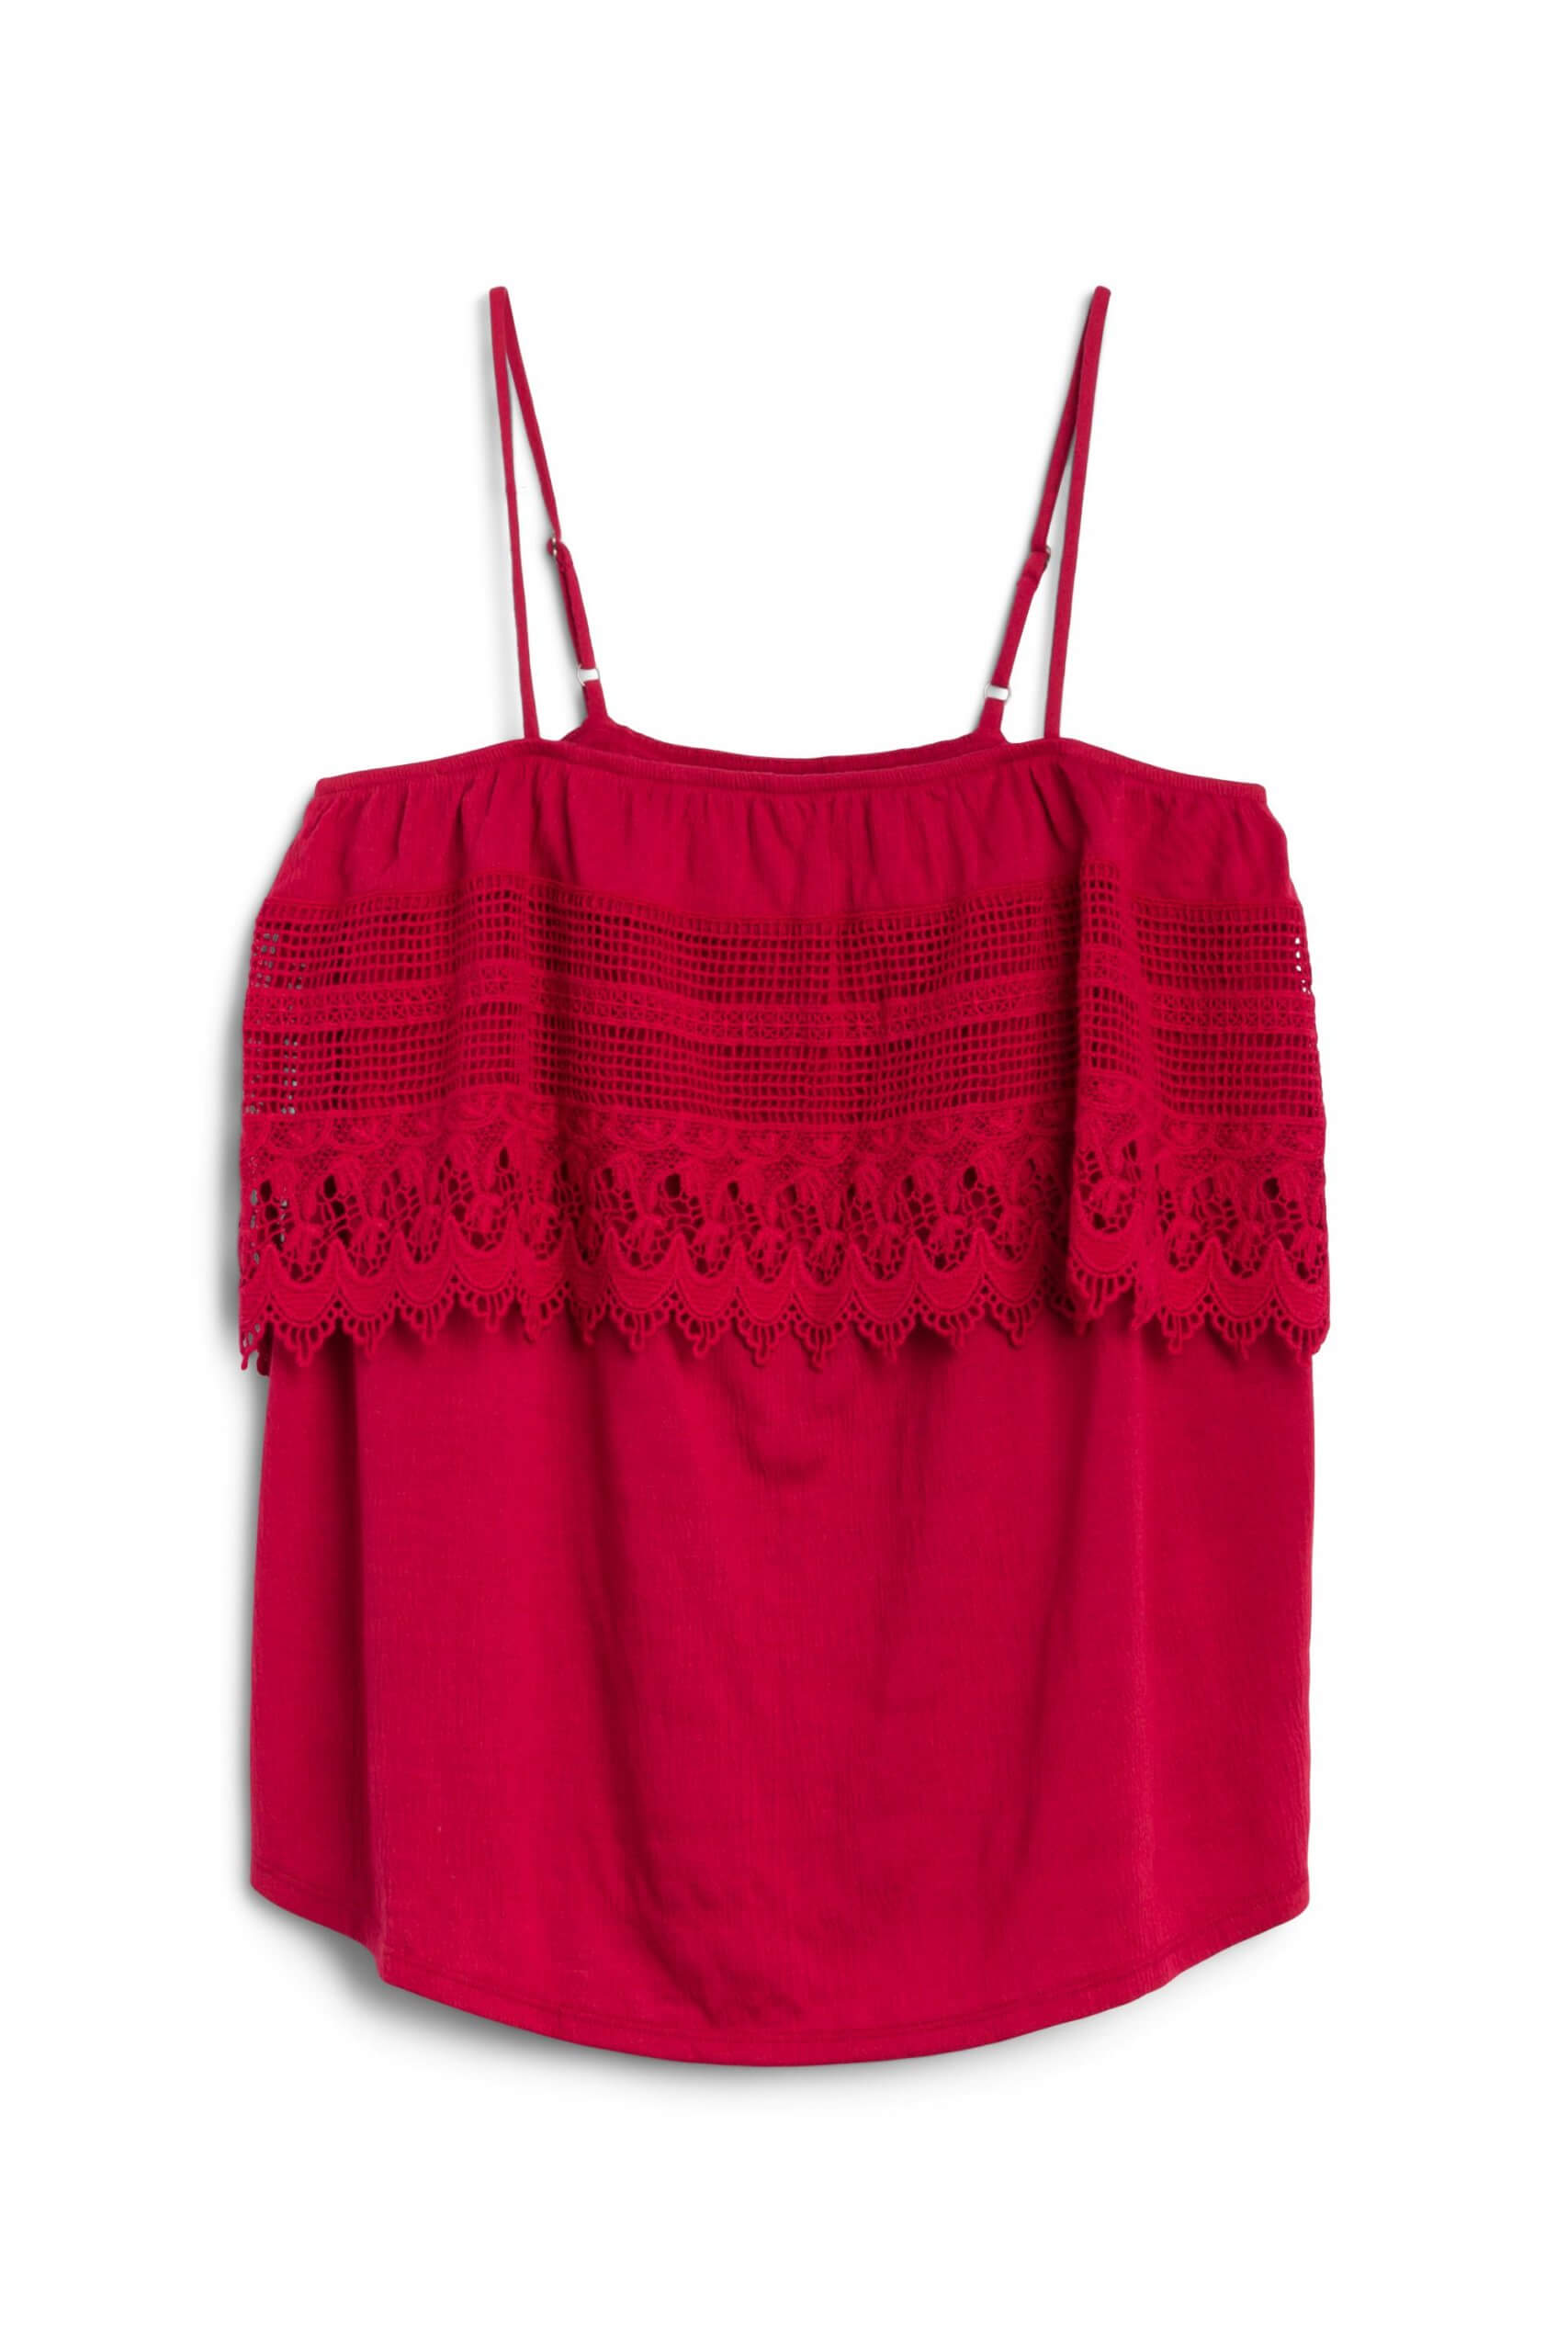 Stitch Fix Women's red lace tank.